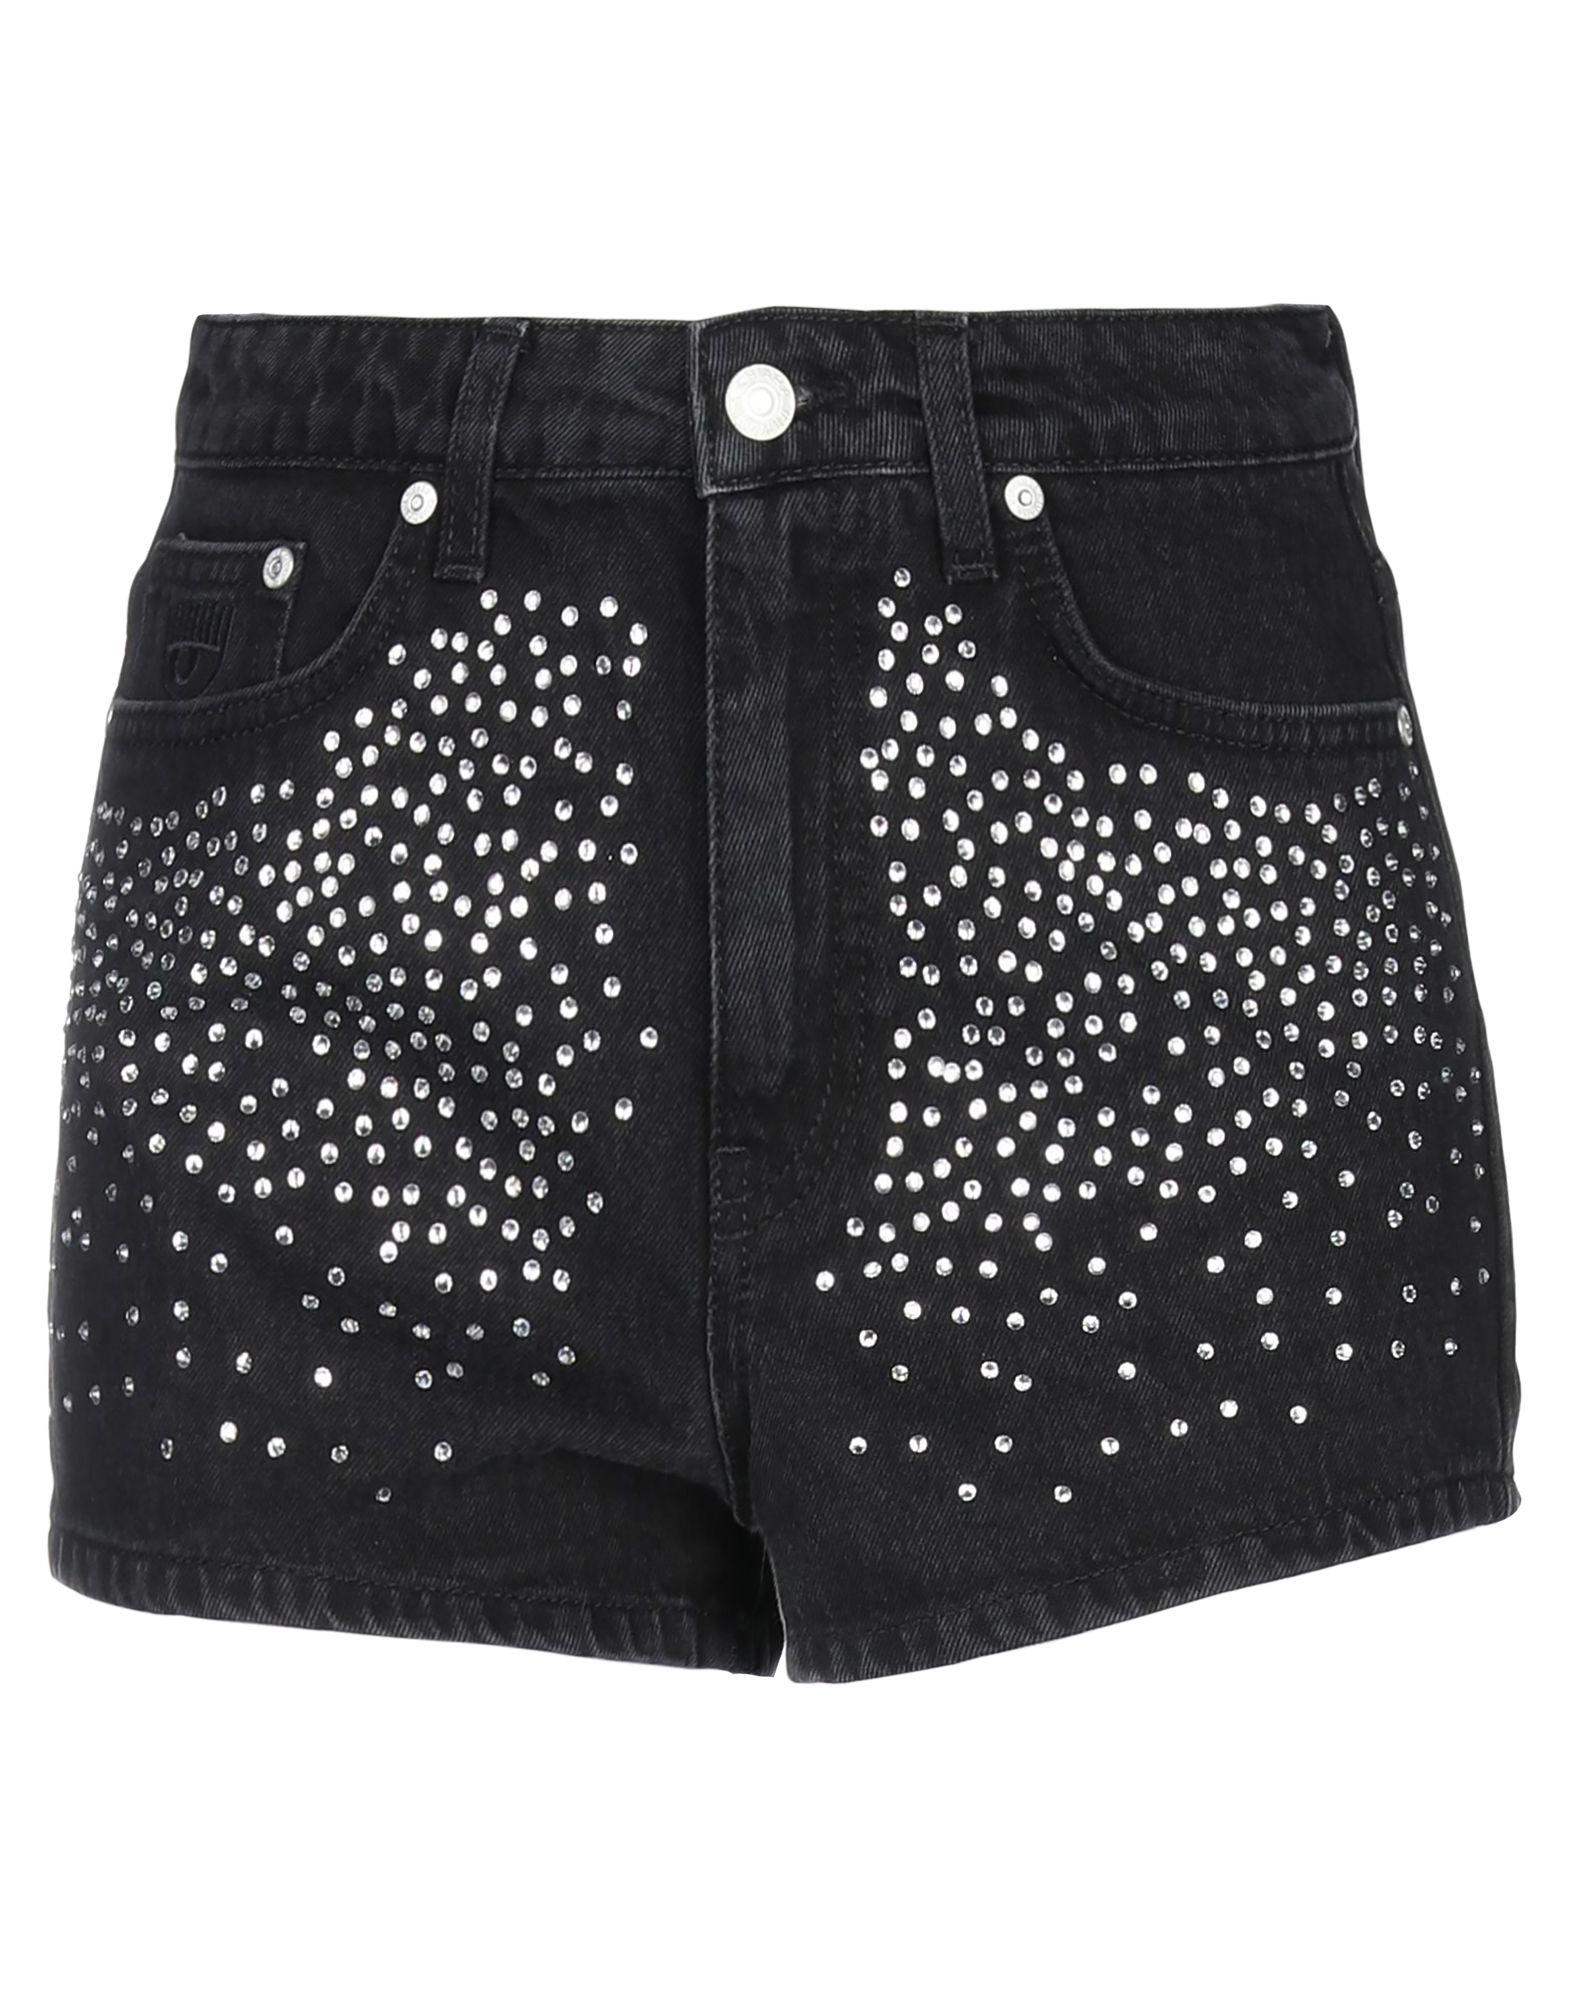 CHIARA FERRAGNI Джинсовые шорты chiara deste джинсовые брюки page 5